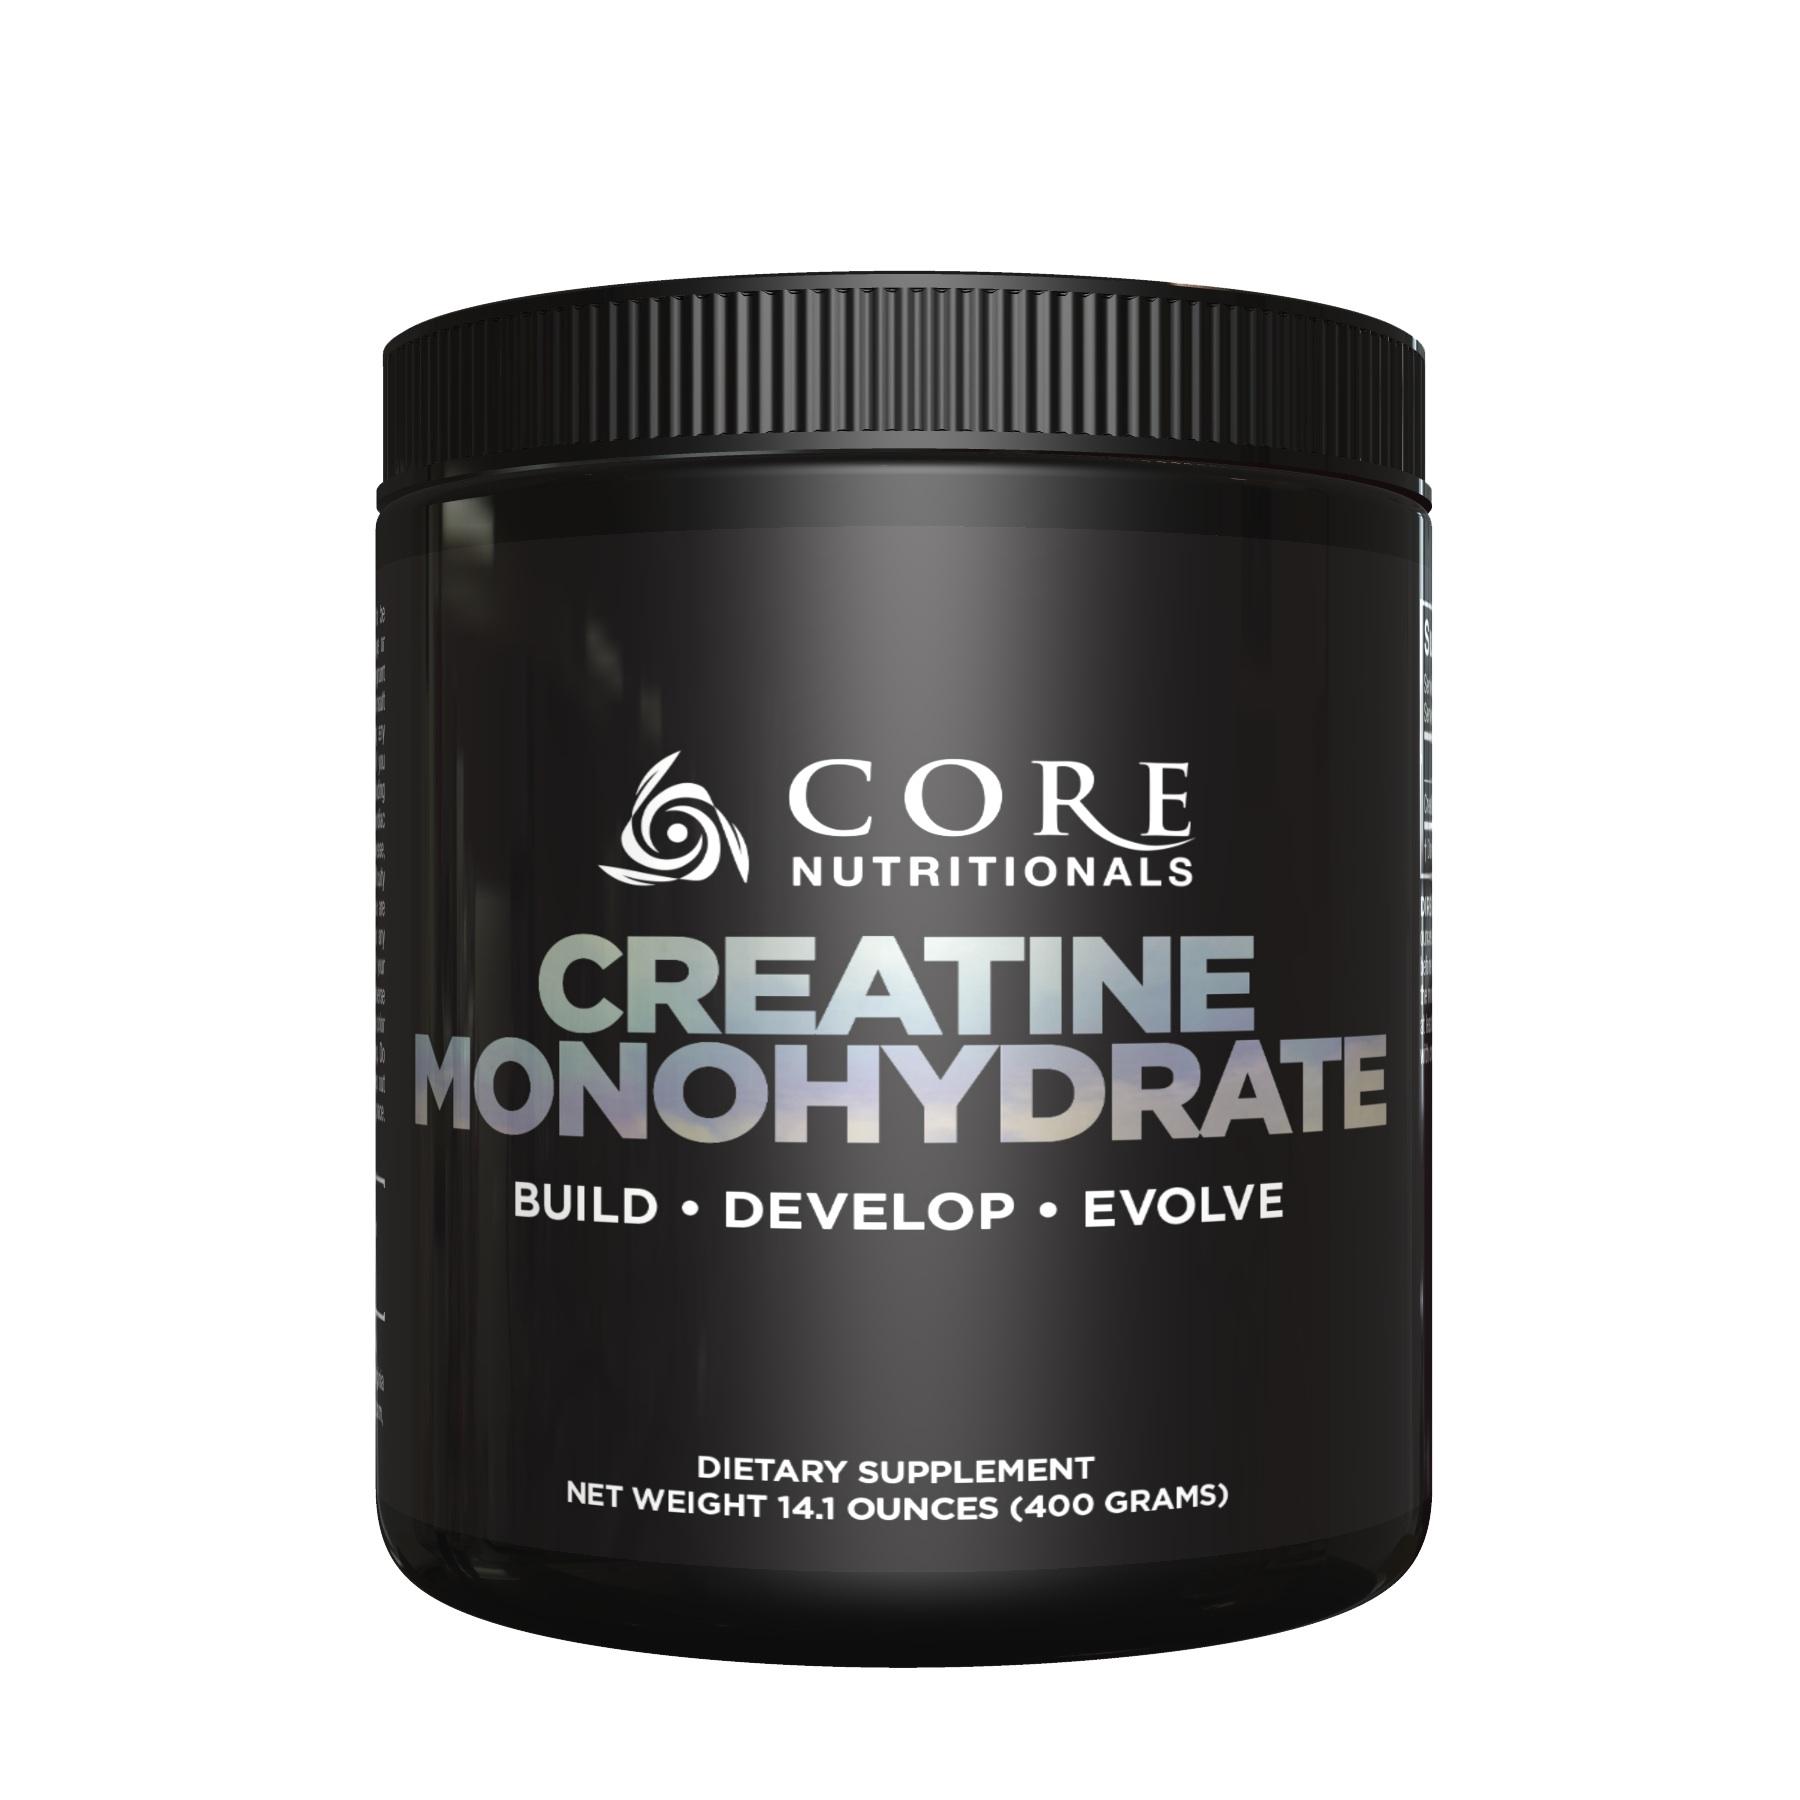 Core Creatine Monohydrate (400 Grams)